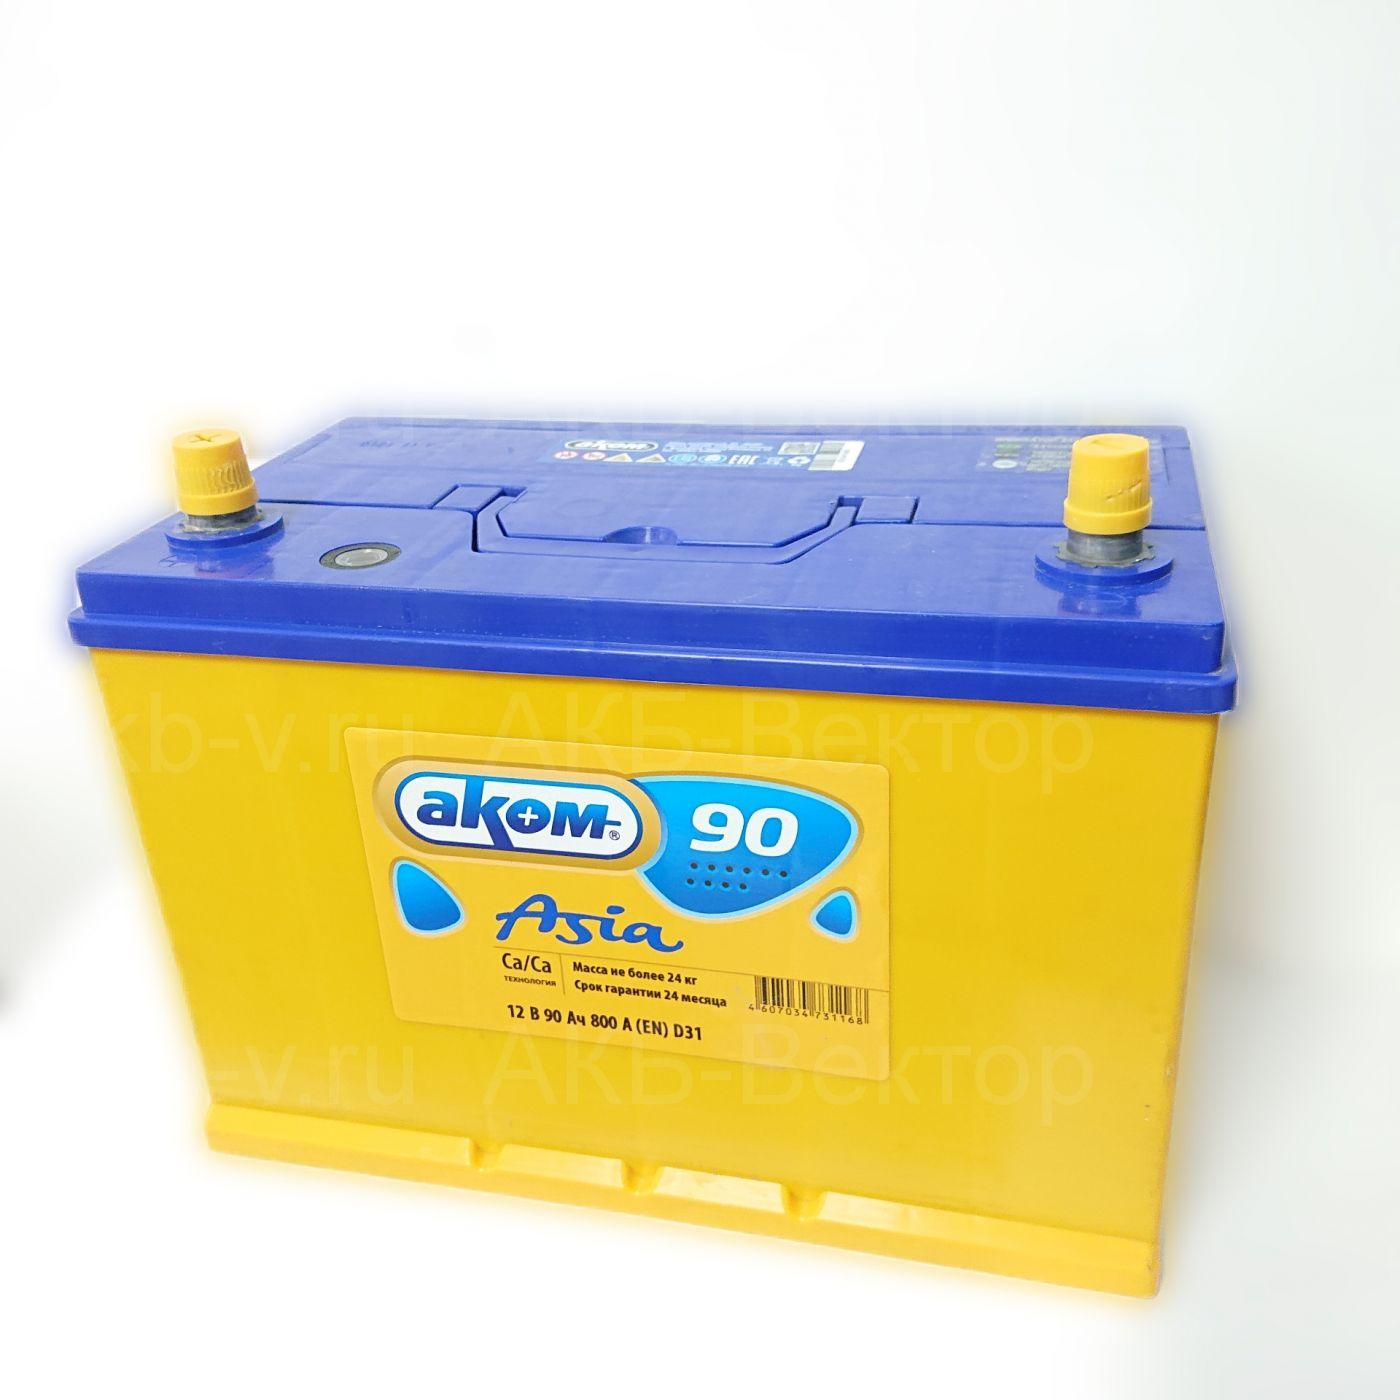 Аккумулятор Аком Asia 90Ач 800А(EN) (D31) 2021г